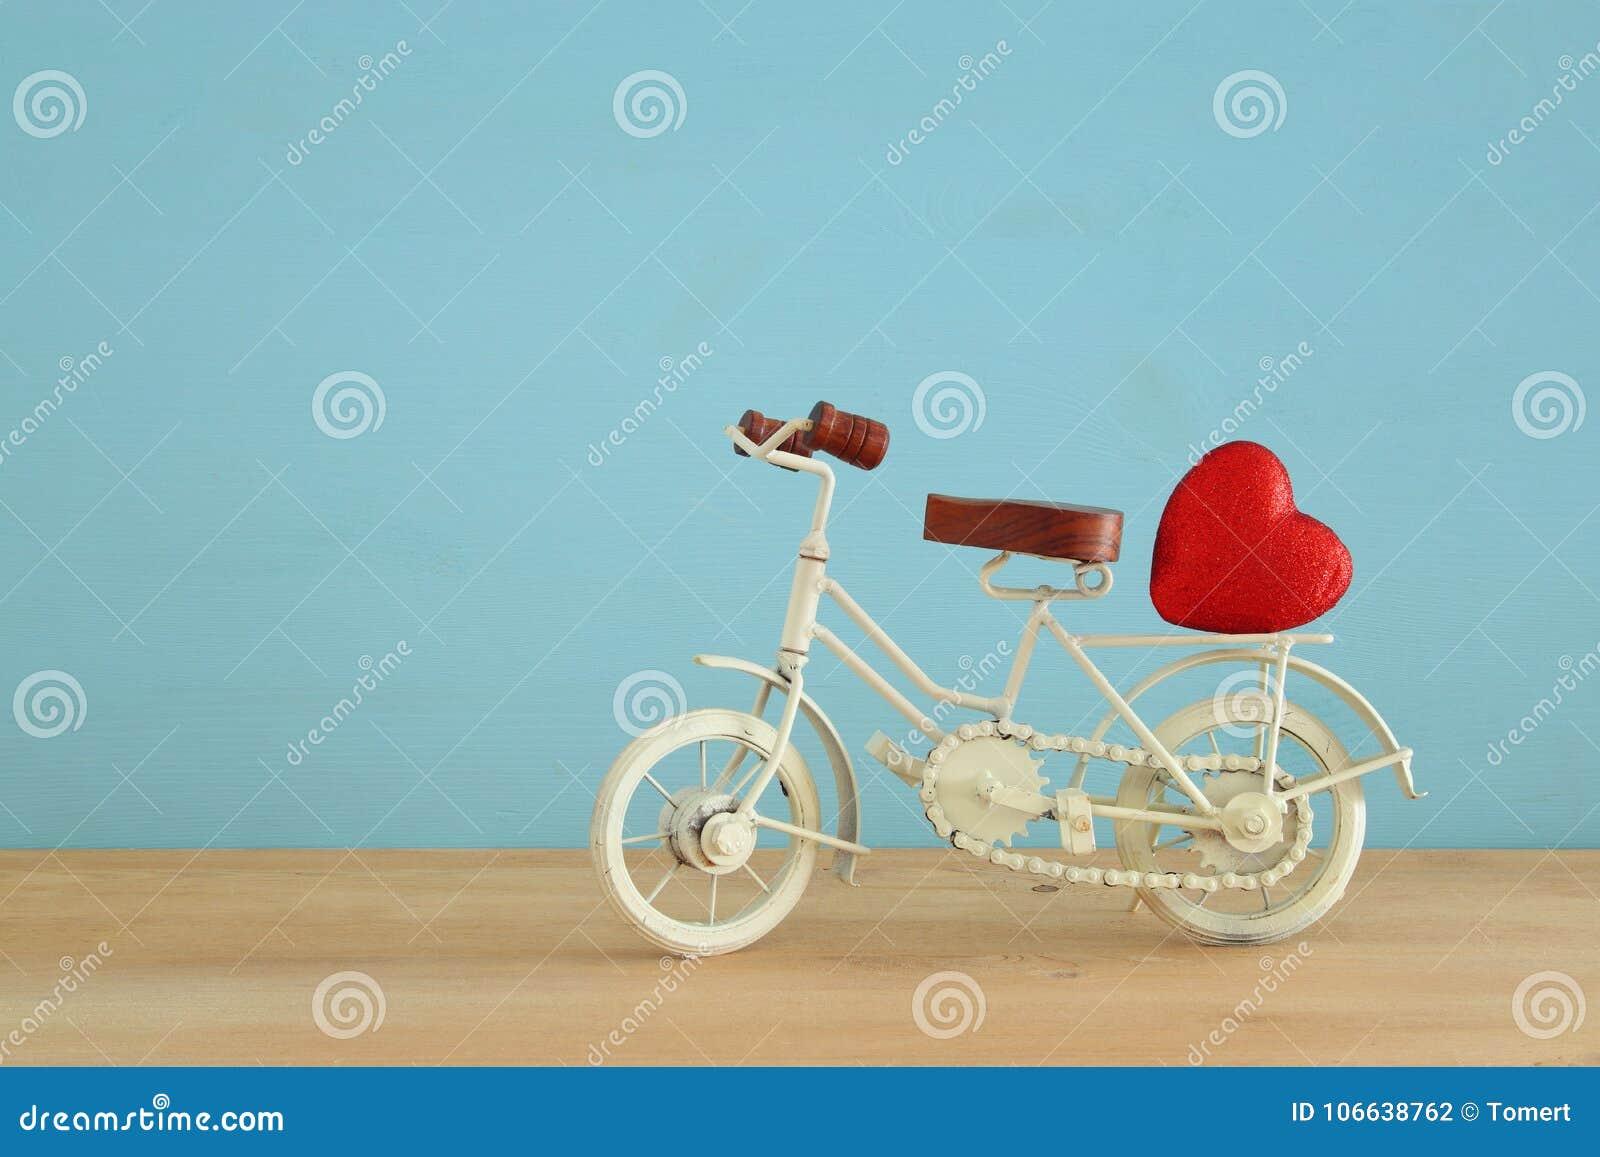 Valentine S Day Vintage Toys : Valentine s day romantic background with white